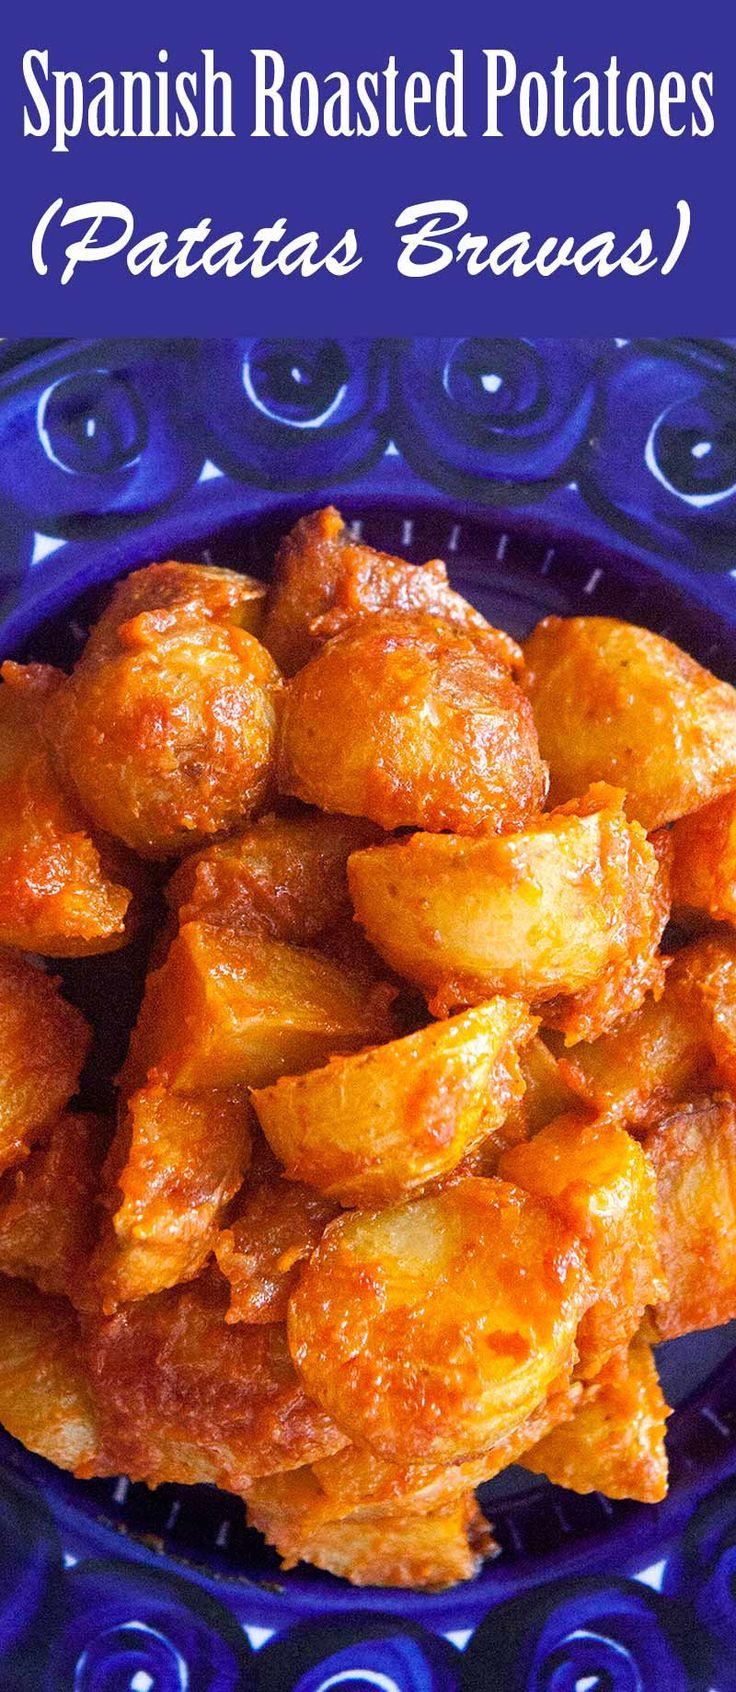 Spanish tapas appetizer known as patatas bravas, or angry potatoes - roasted potatoes tossed with a spicy, smoky tomato sauce.#potatoes #patatasbravas #potatorecipes